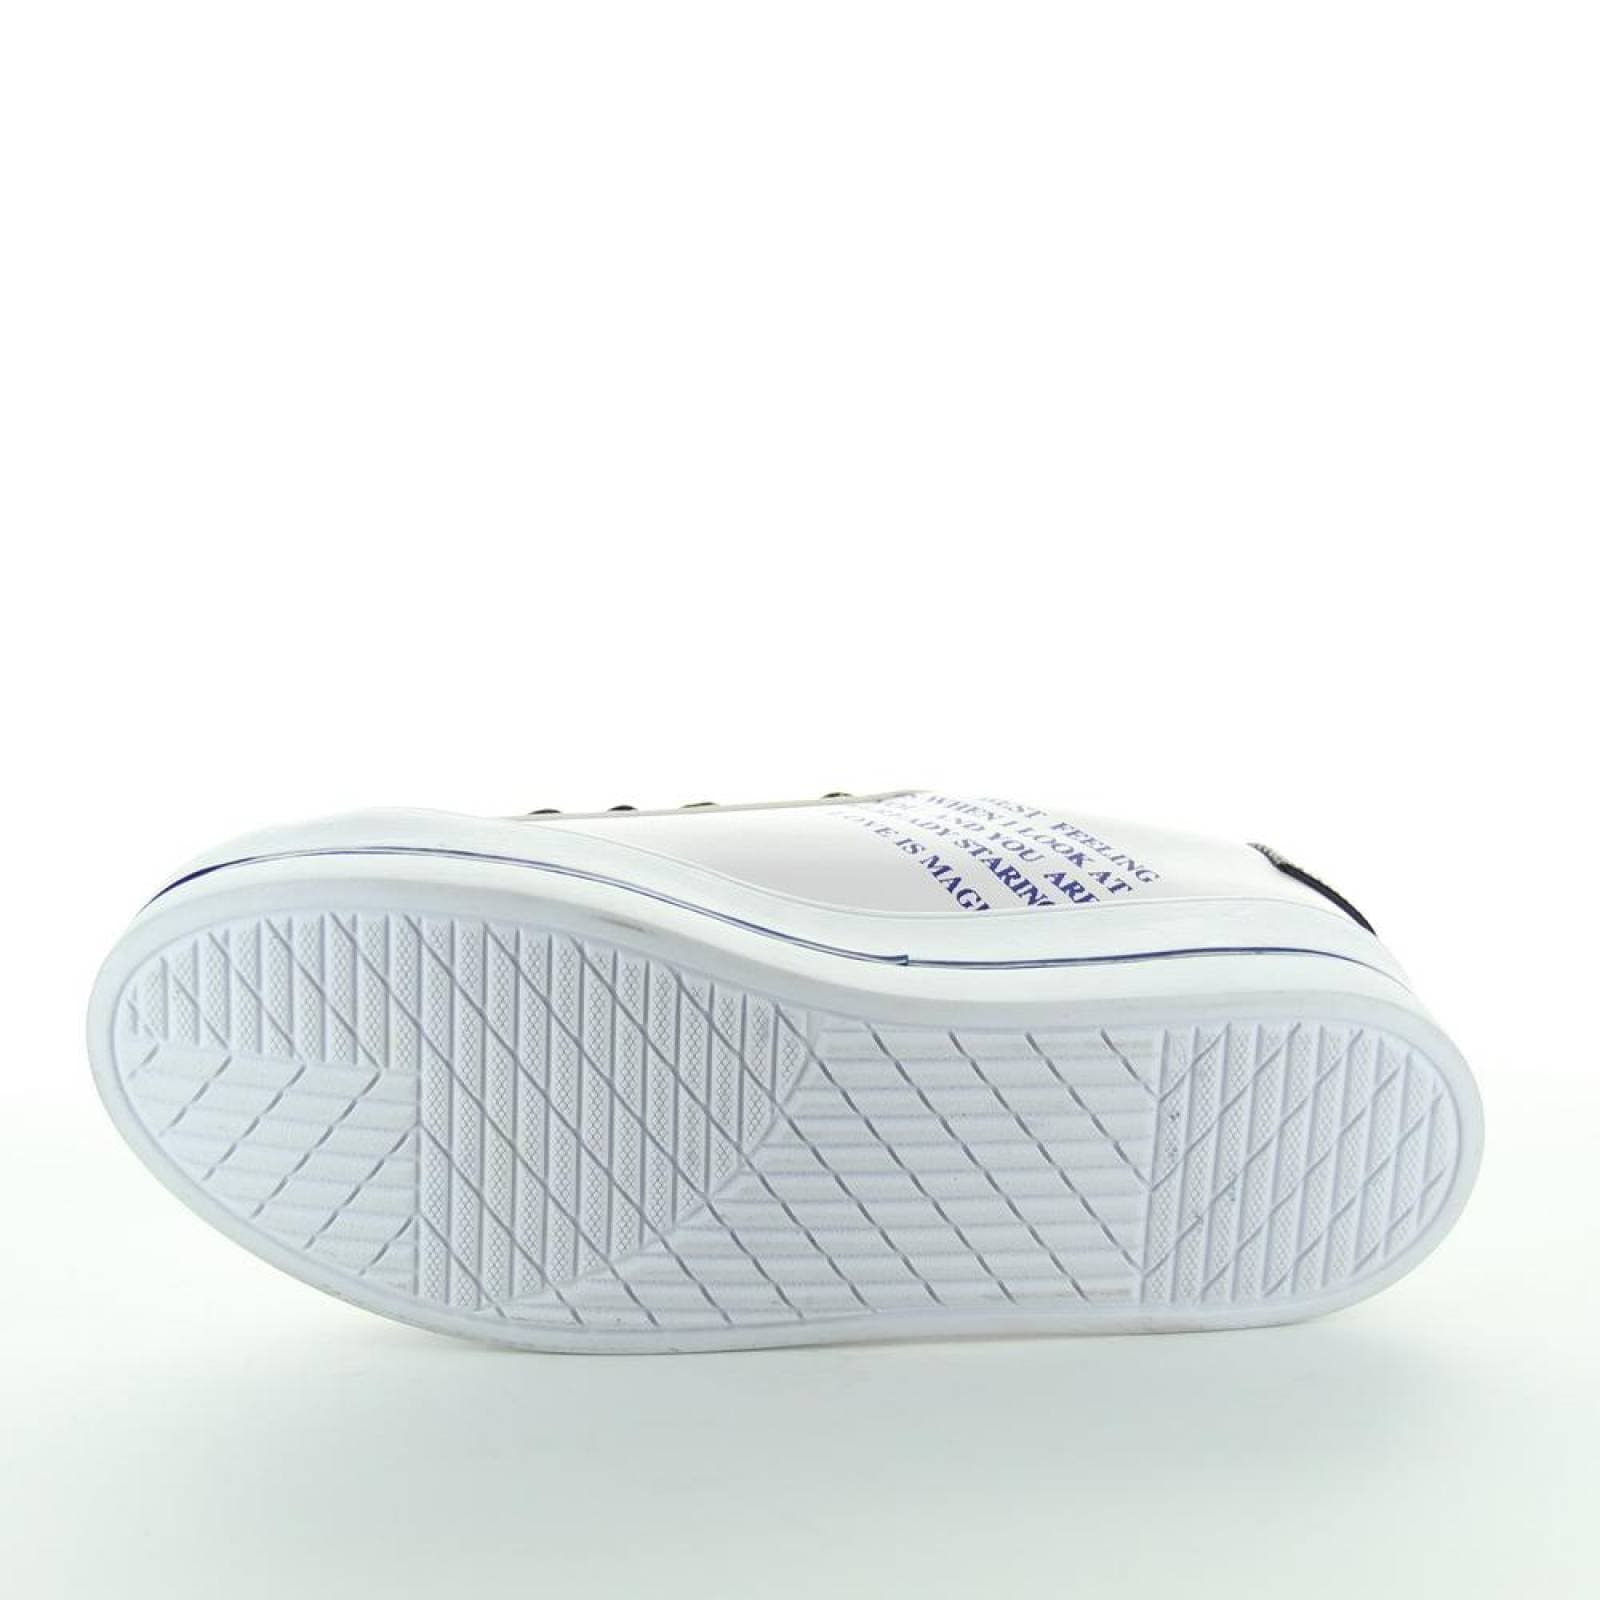 Tenis Suhey Mujer Blanco Tipo Napa 8802